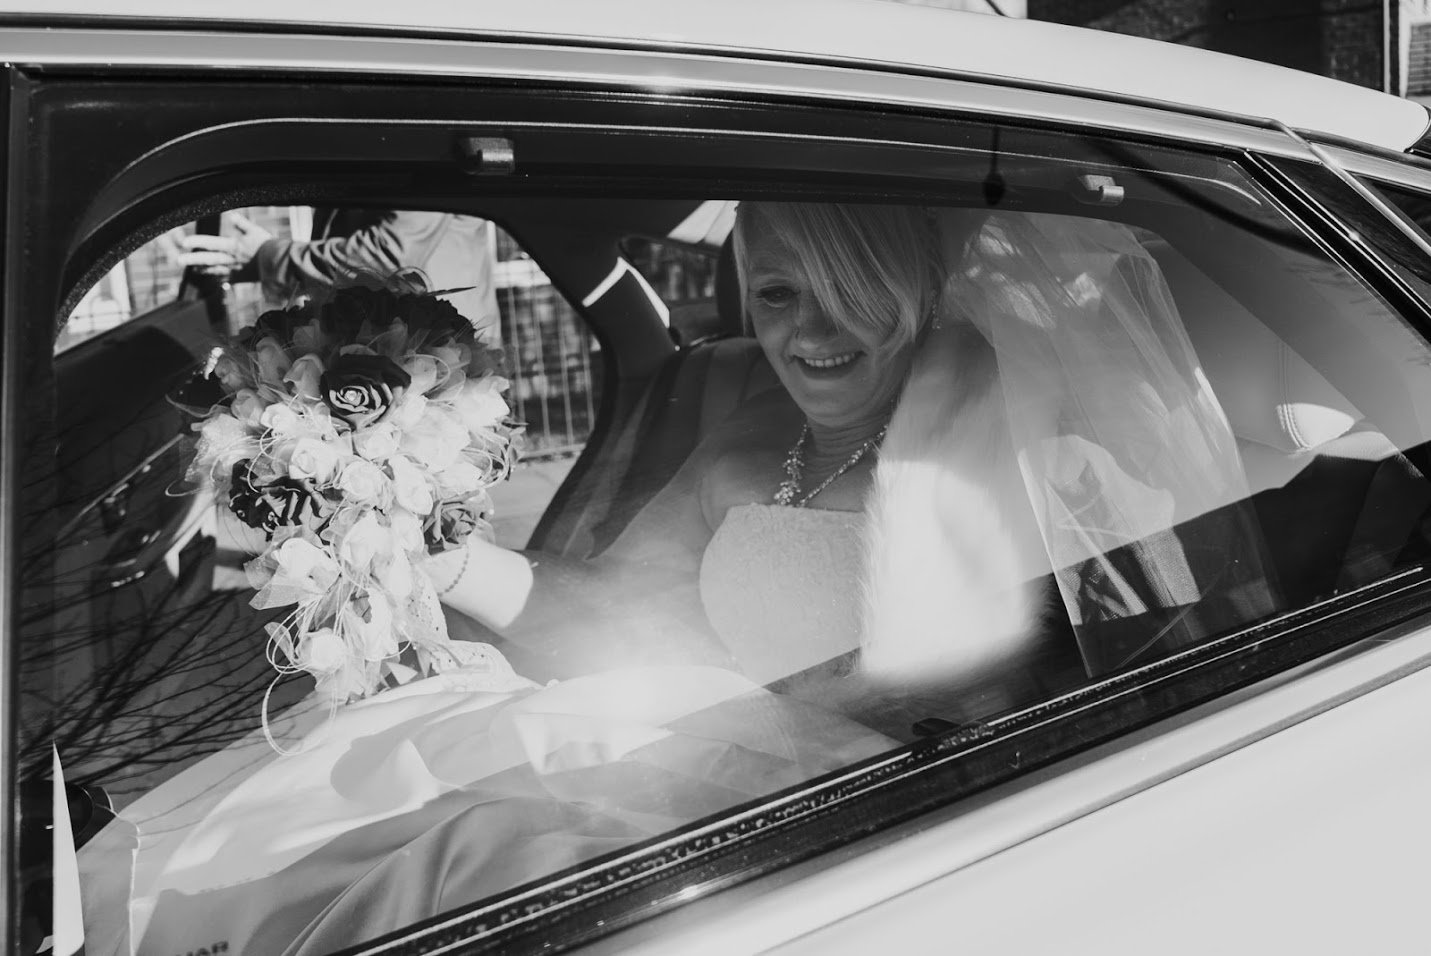 MarkHeather 151704 1 - Solihull Registry Office Wedding - Mark & Heather